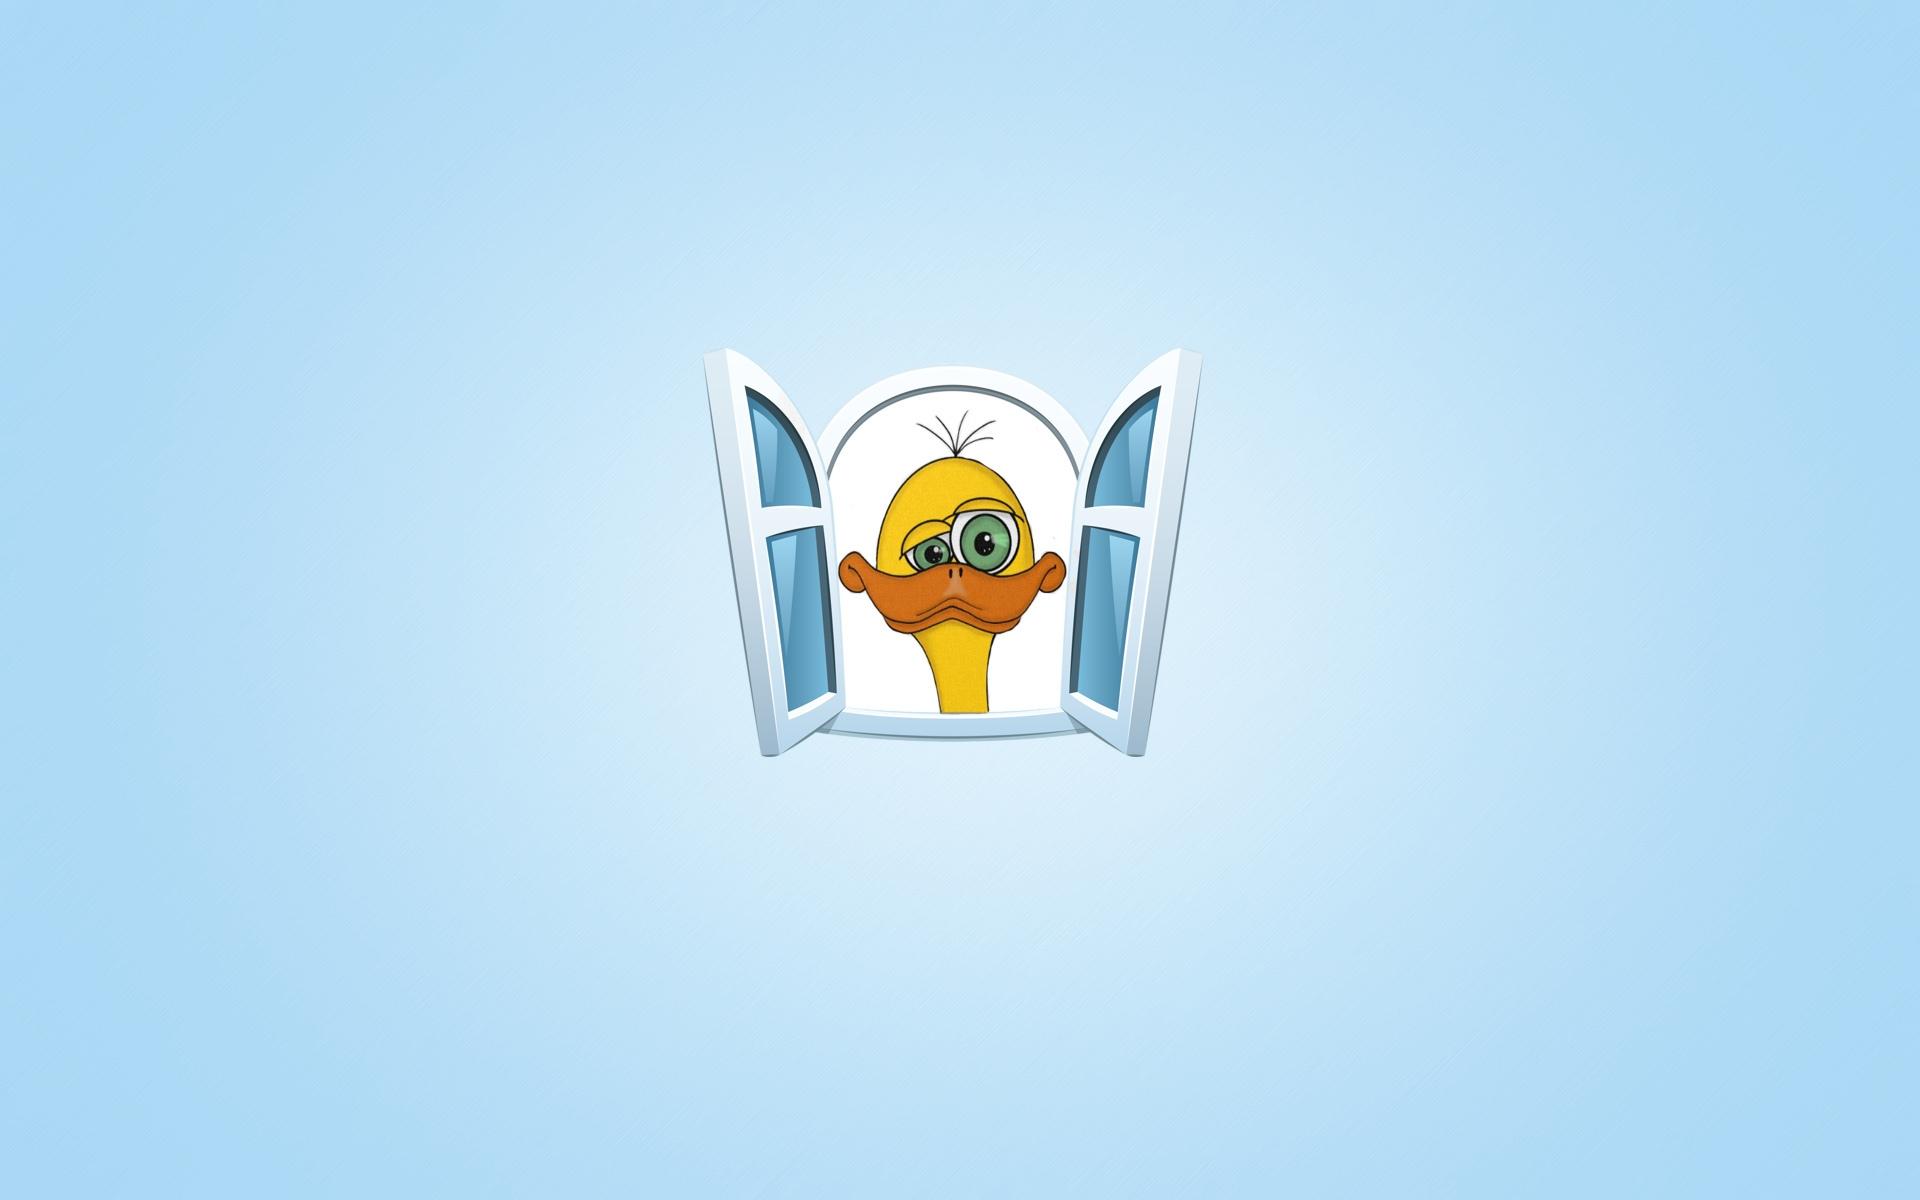 Wallpaper Ilustrasi Logo Gambar Kartun Sedih Bebek